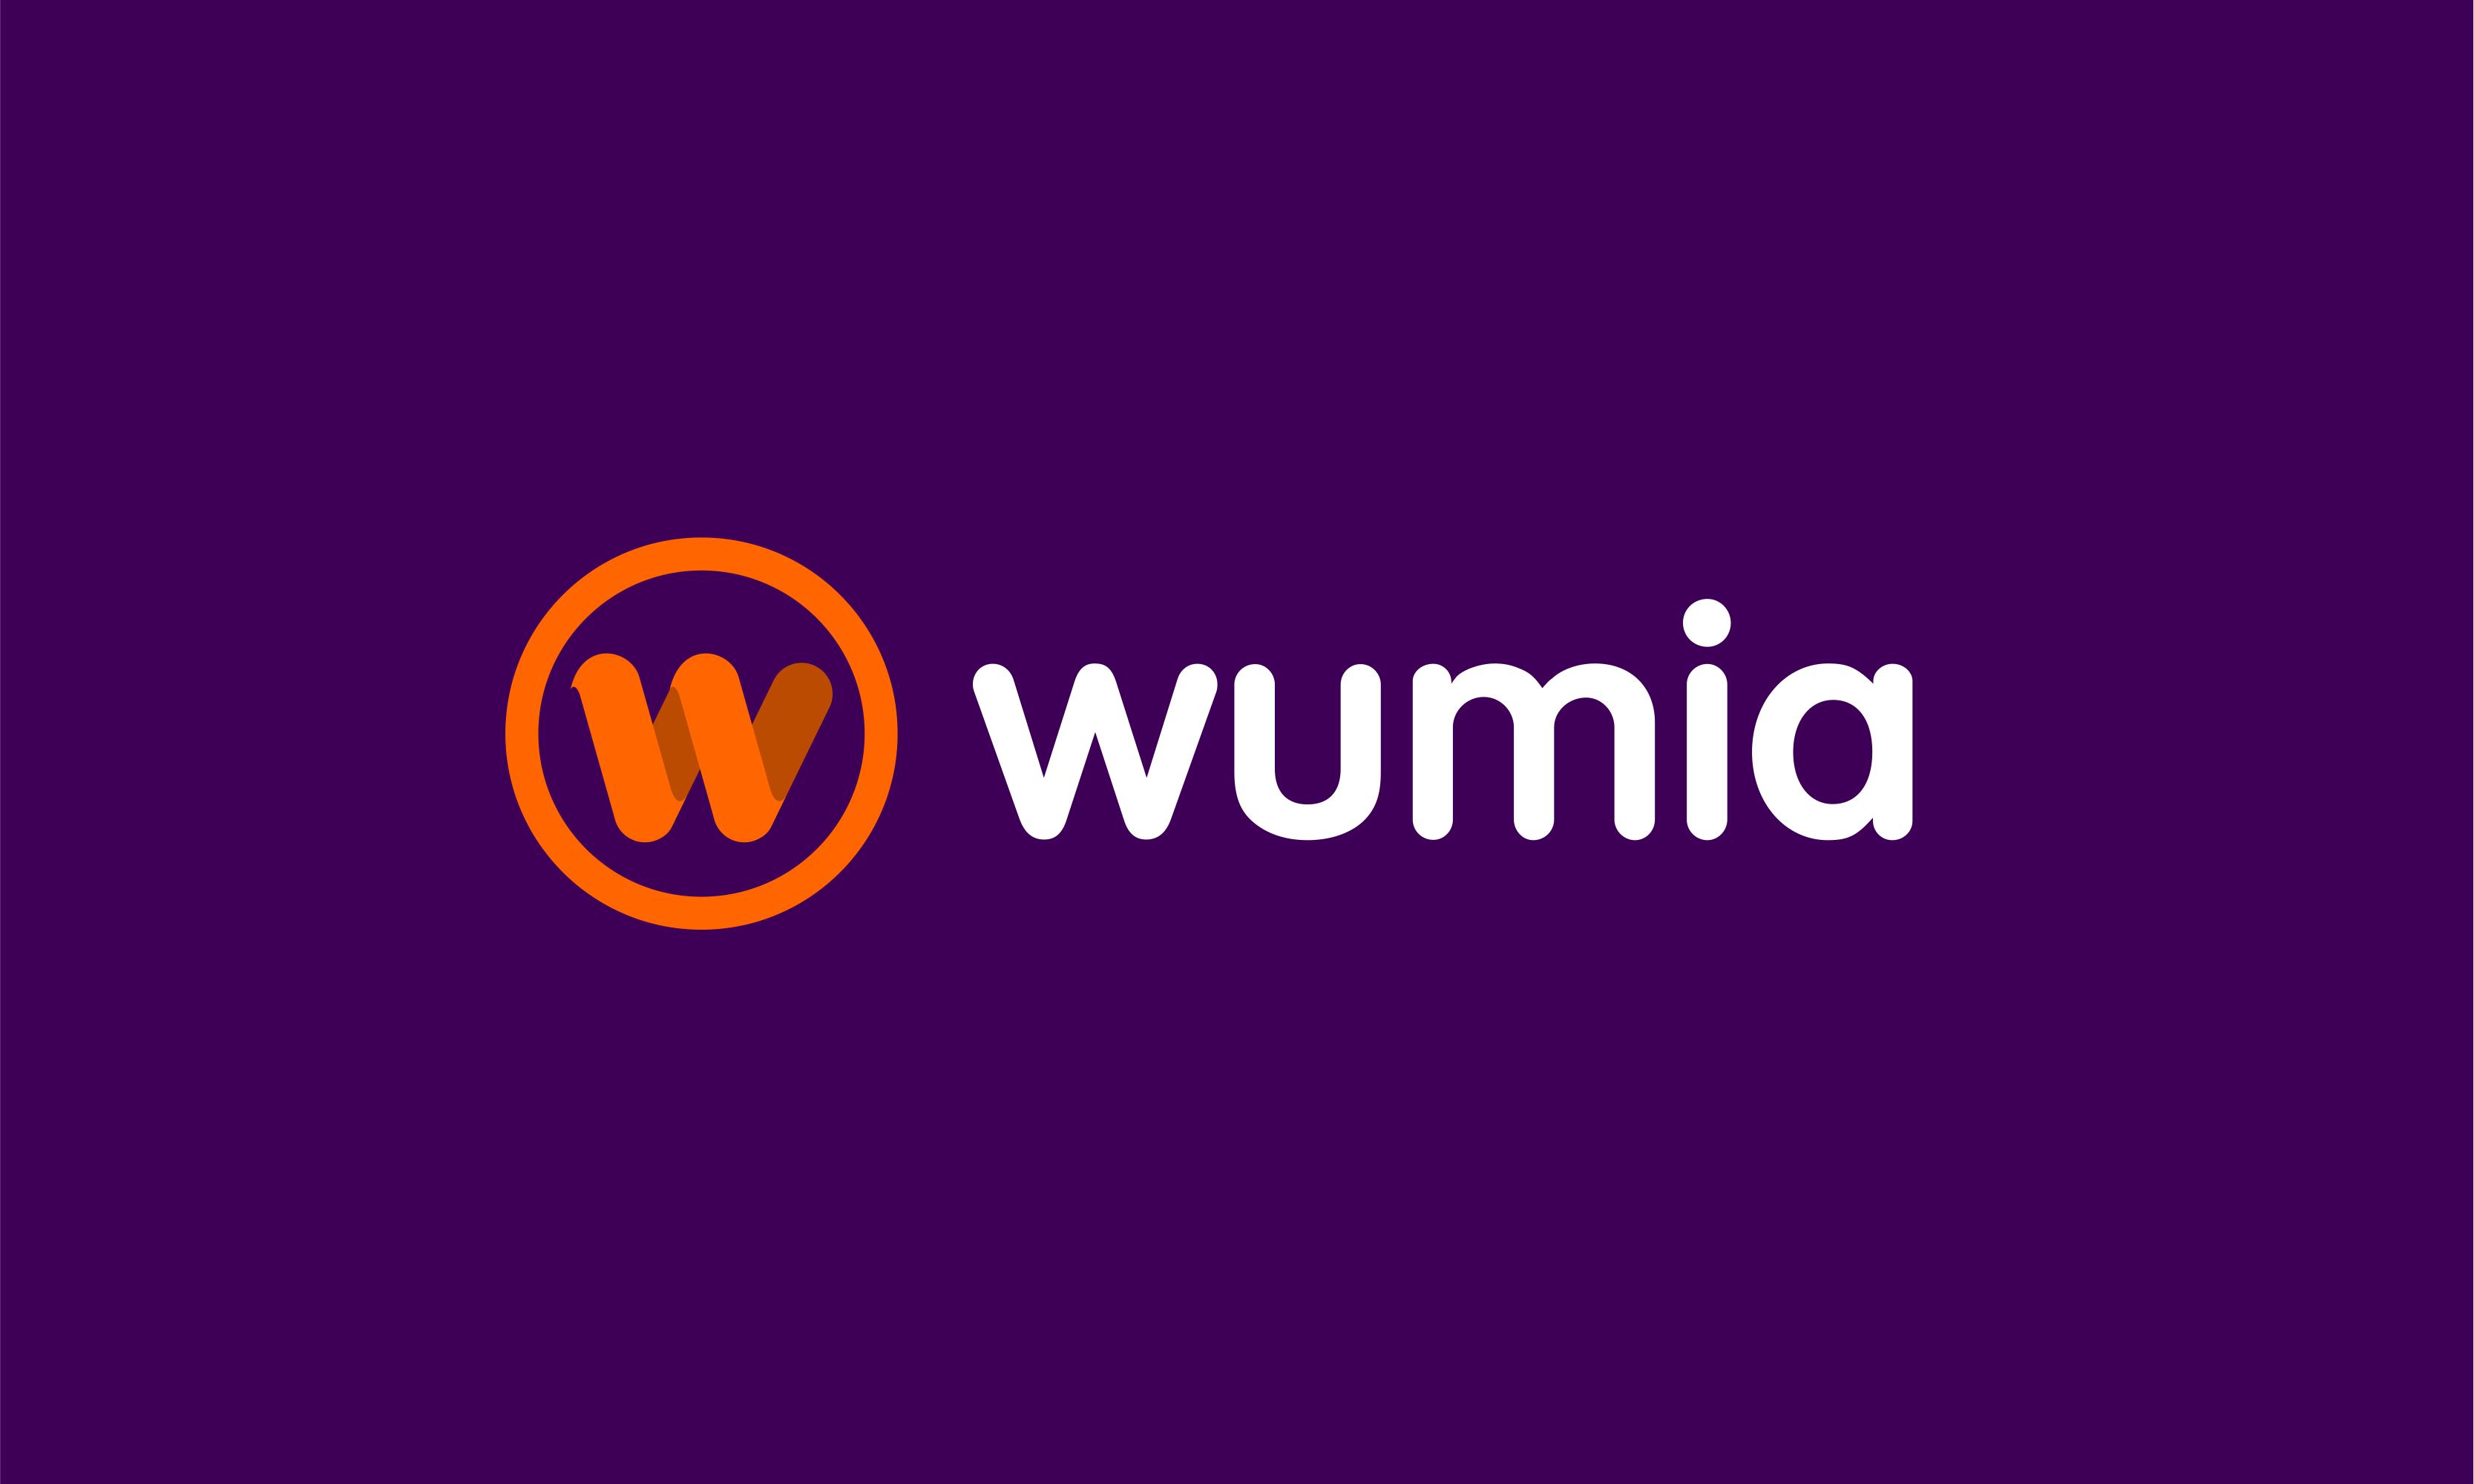 wumia